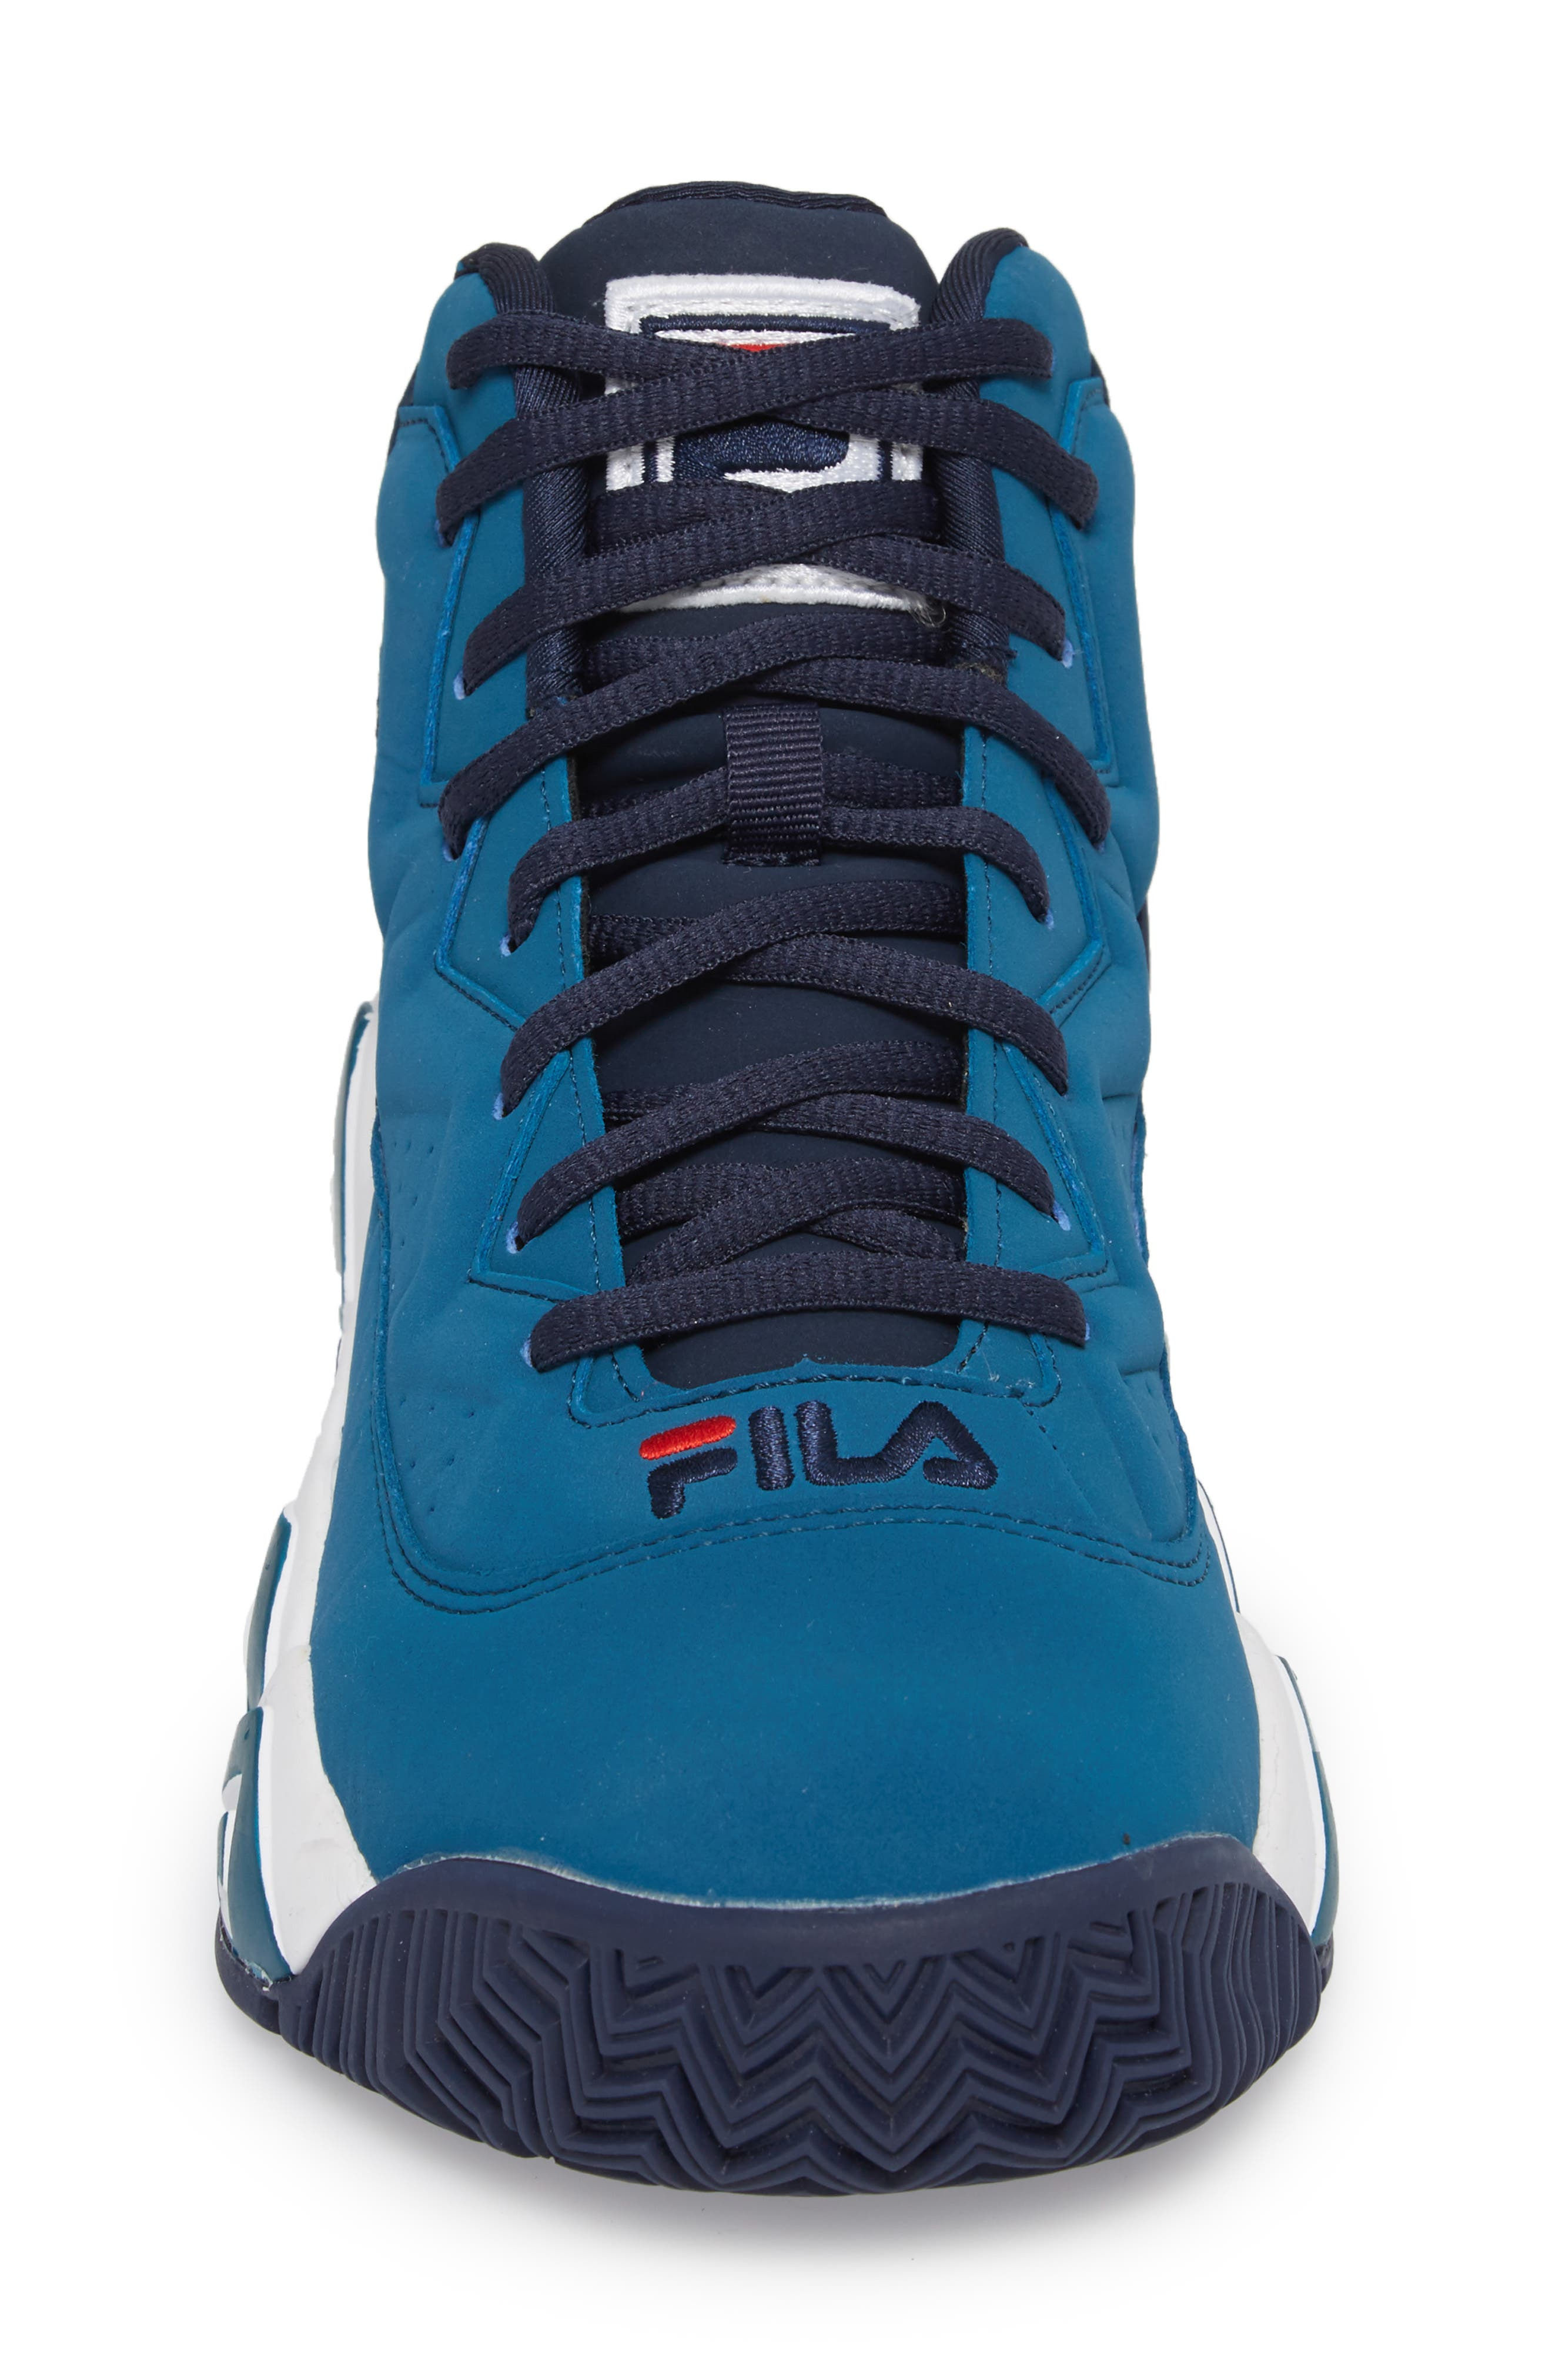 MB High Top Sneaker,                             Alternate thumbnail 4, color,                             INK BLUE/ FILA NAVY